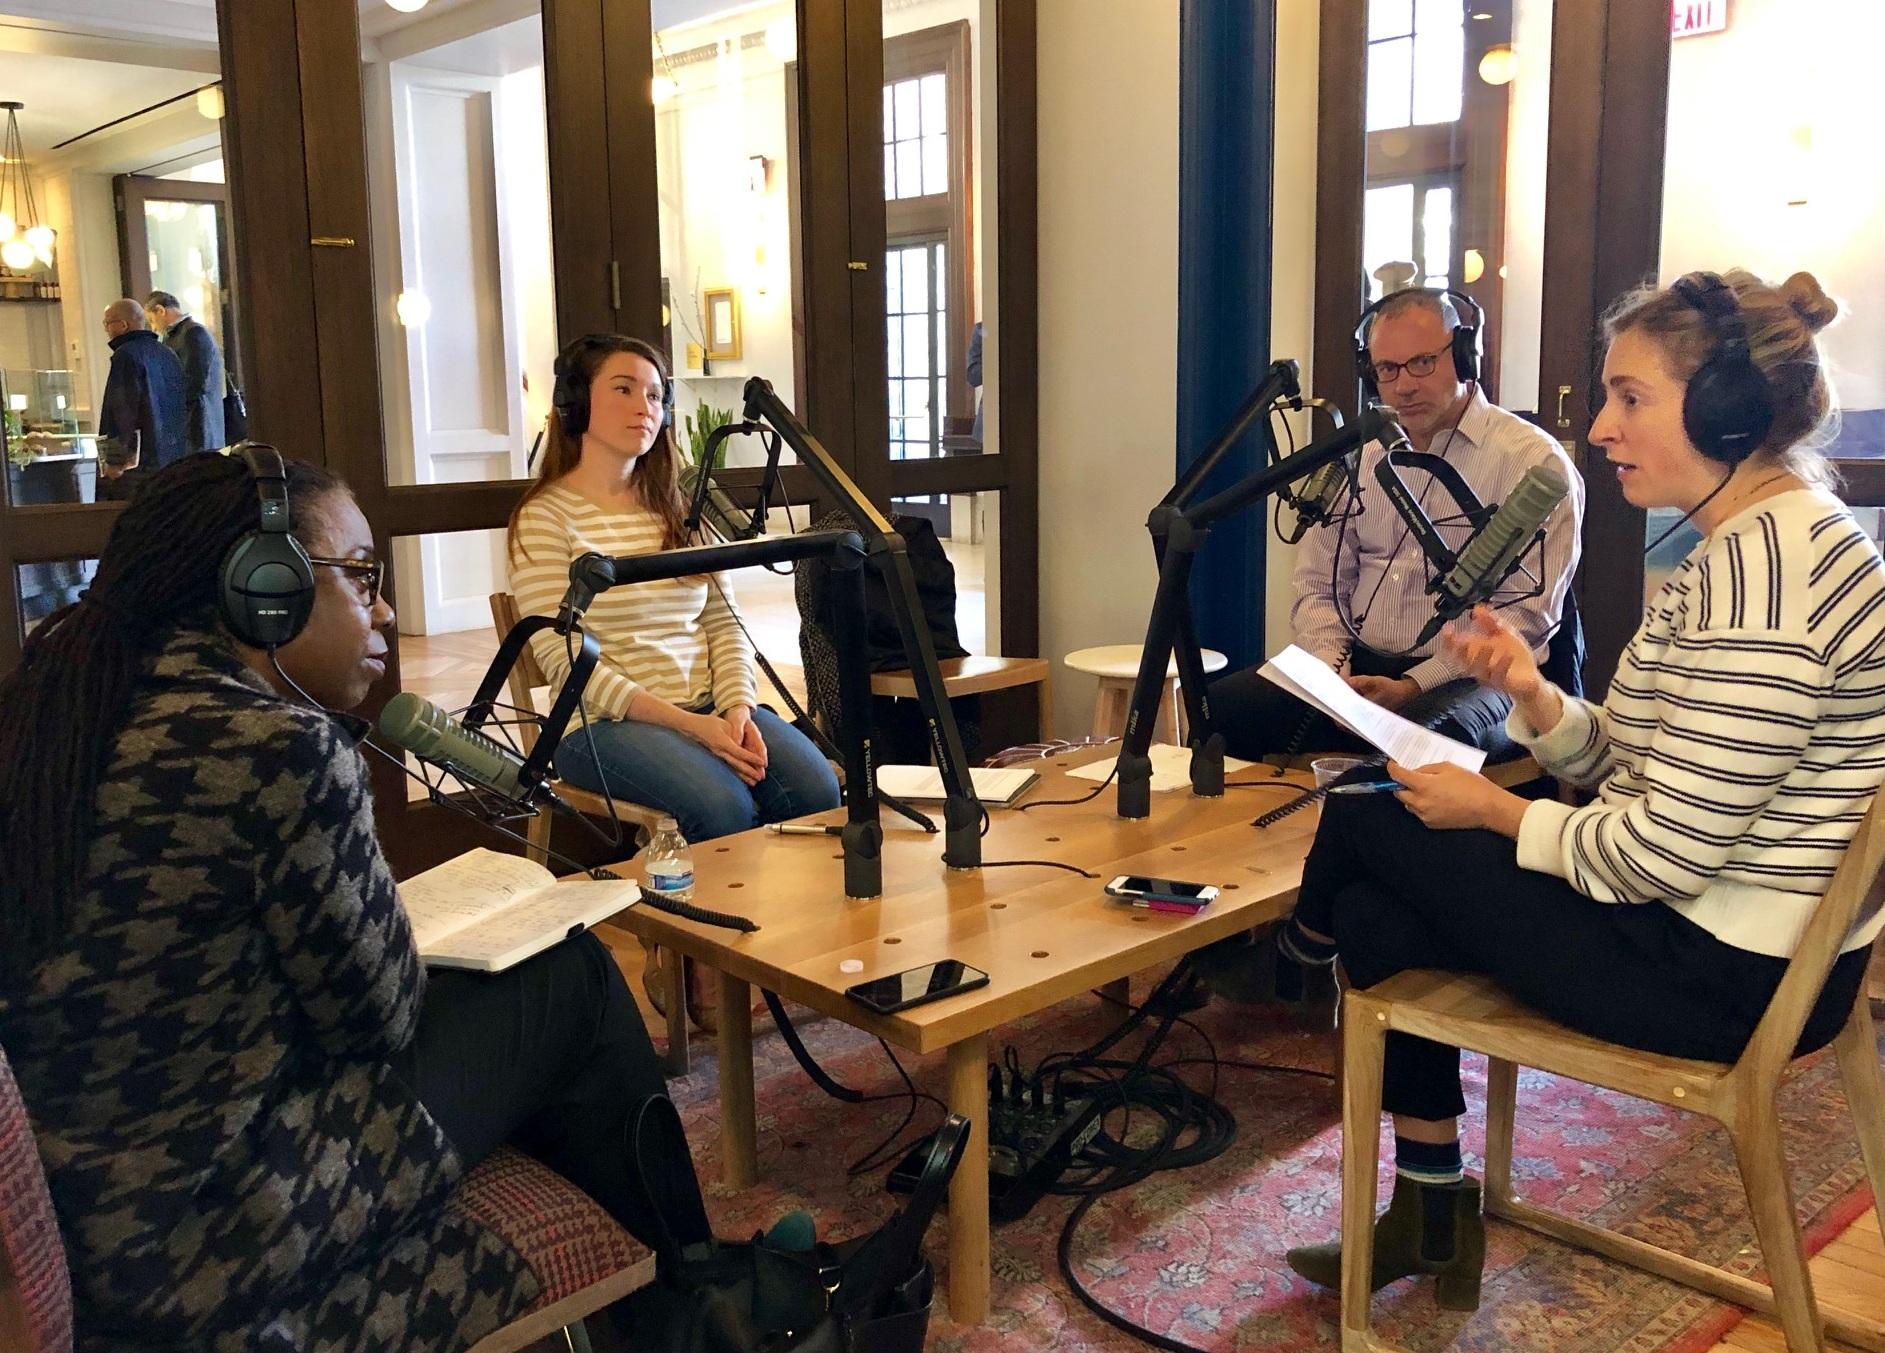 Investing in Food, Episode 1: Inside the Mind of the Investor  with Celeste James, Leila Otis and Eric Kessler